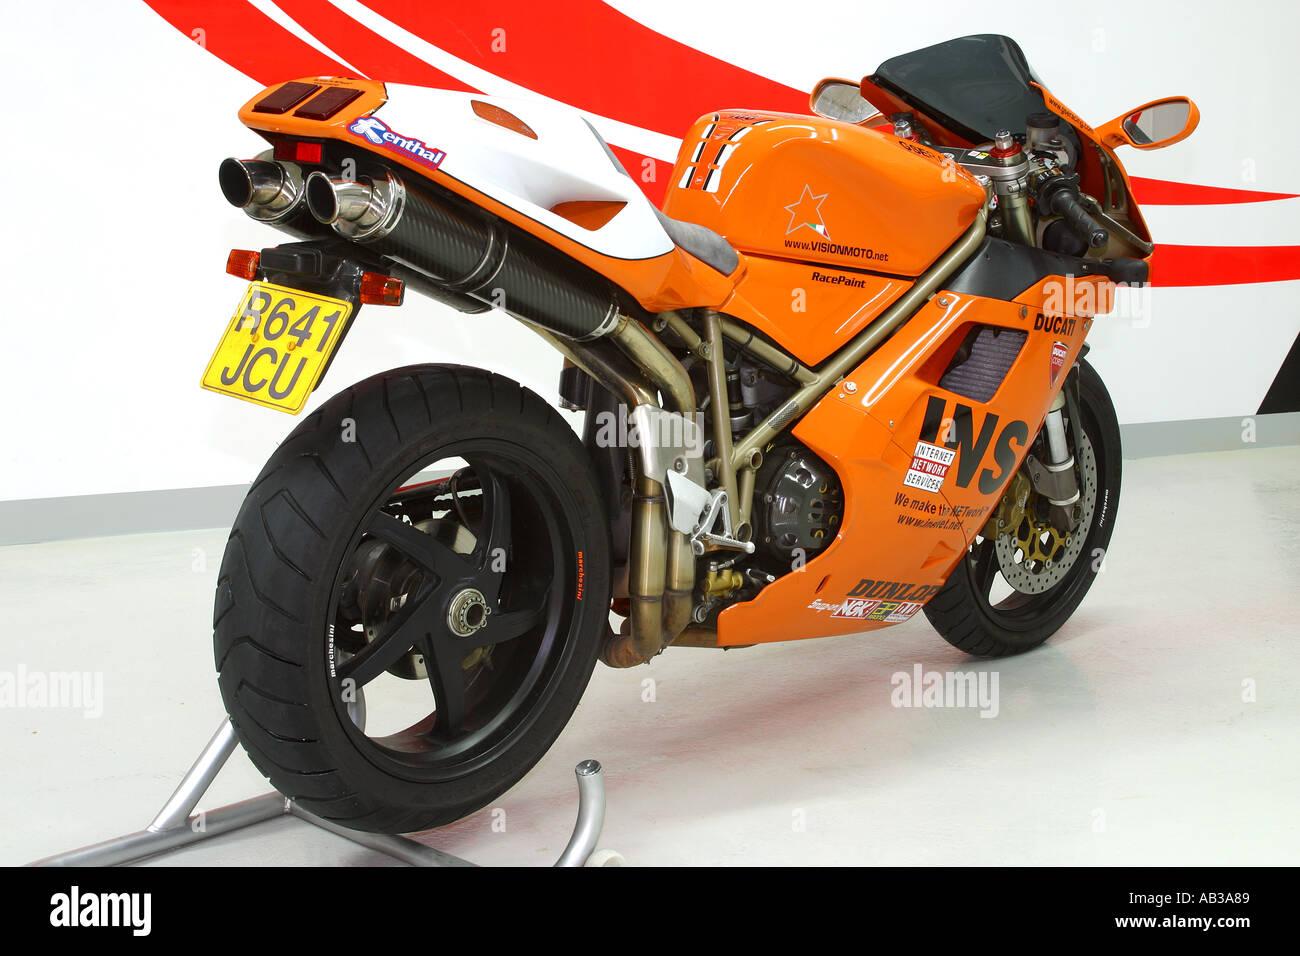 Ducati 748 Race Replica